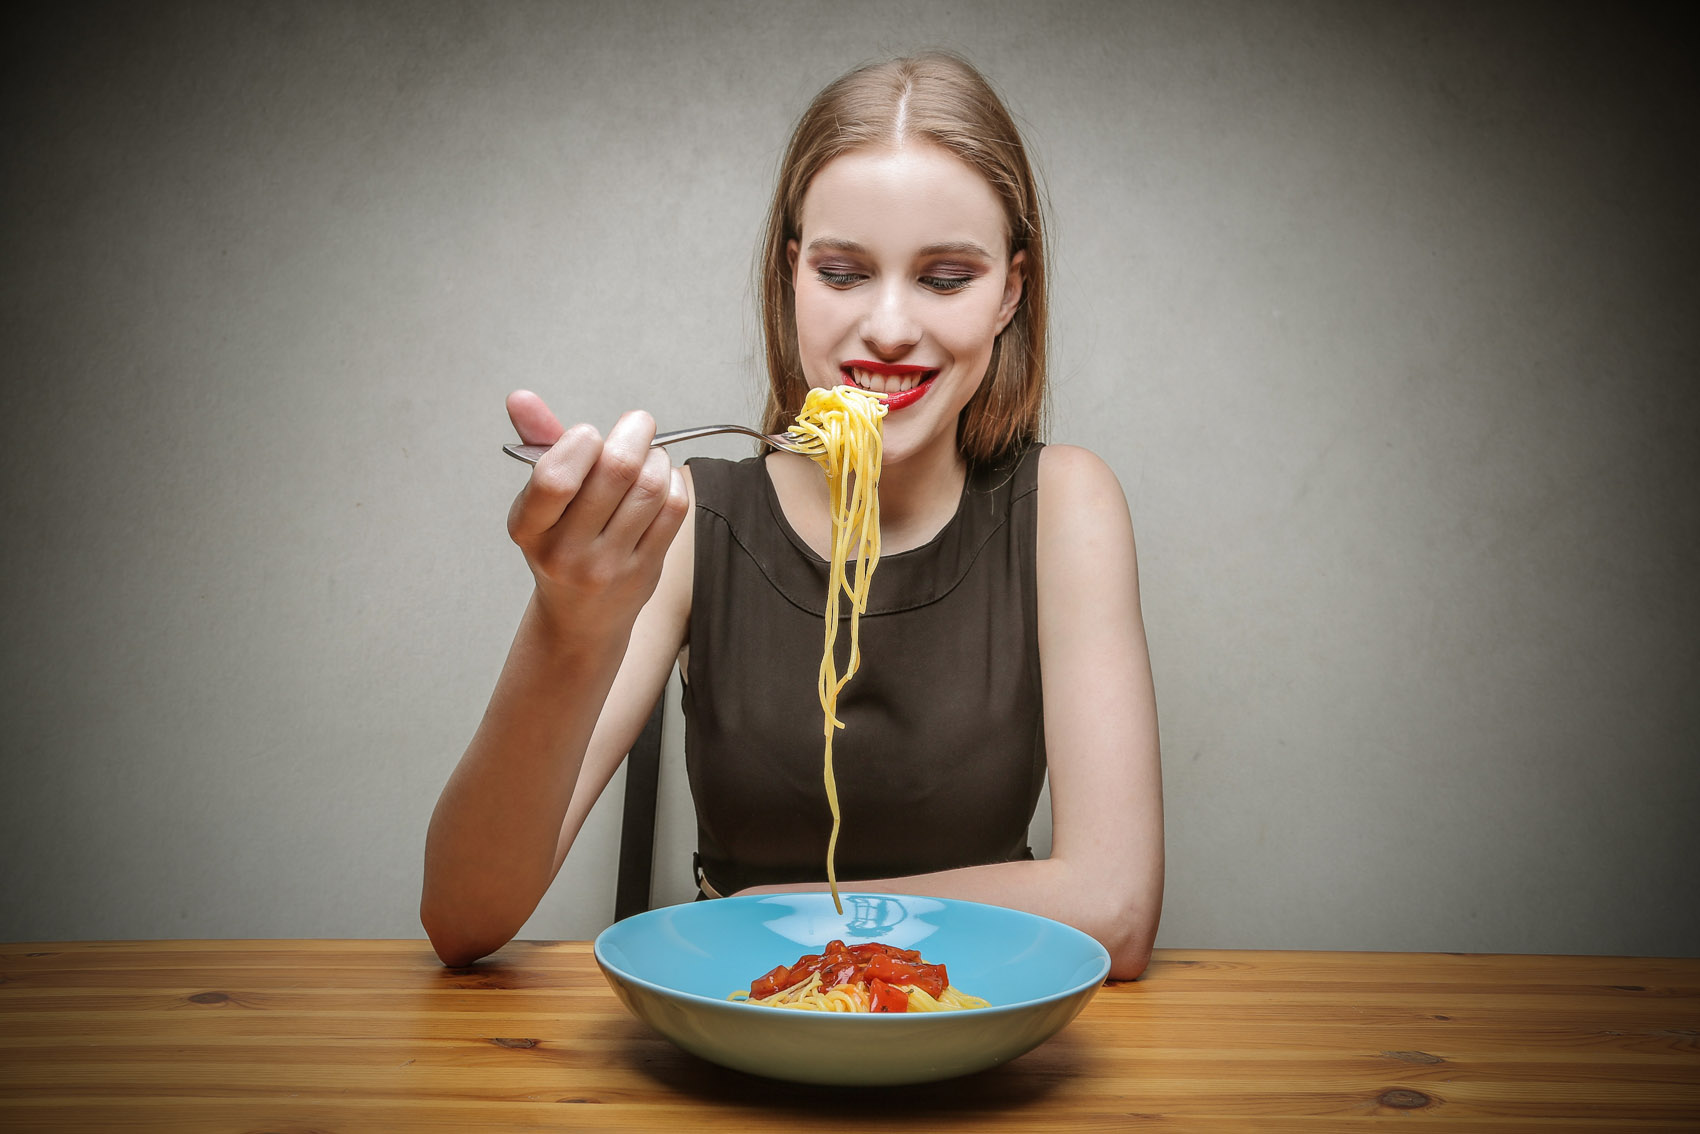 donna mangia spaghetti